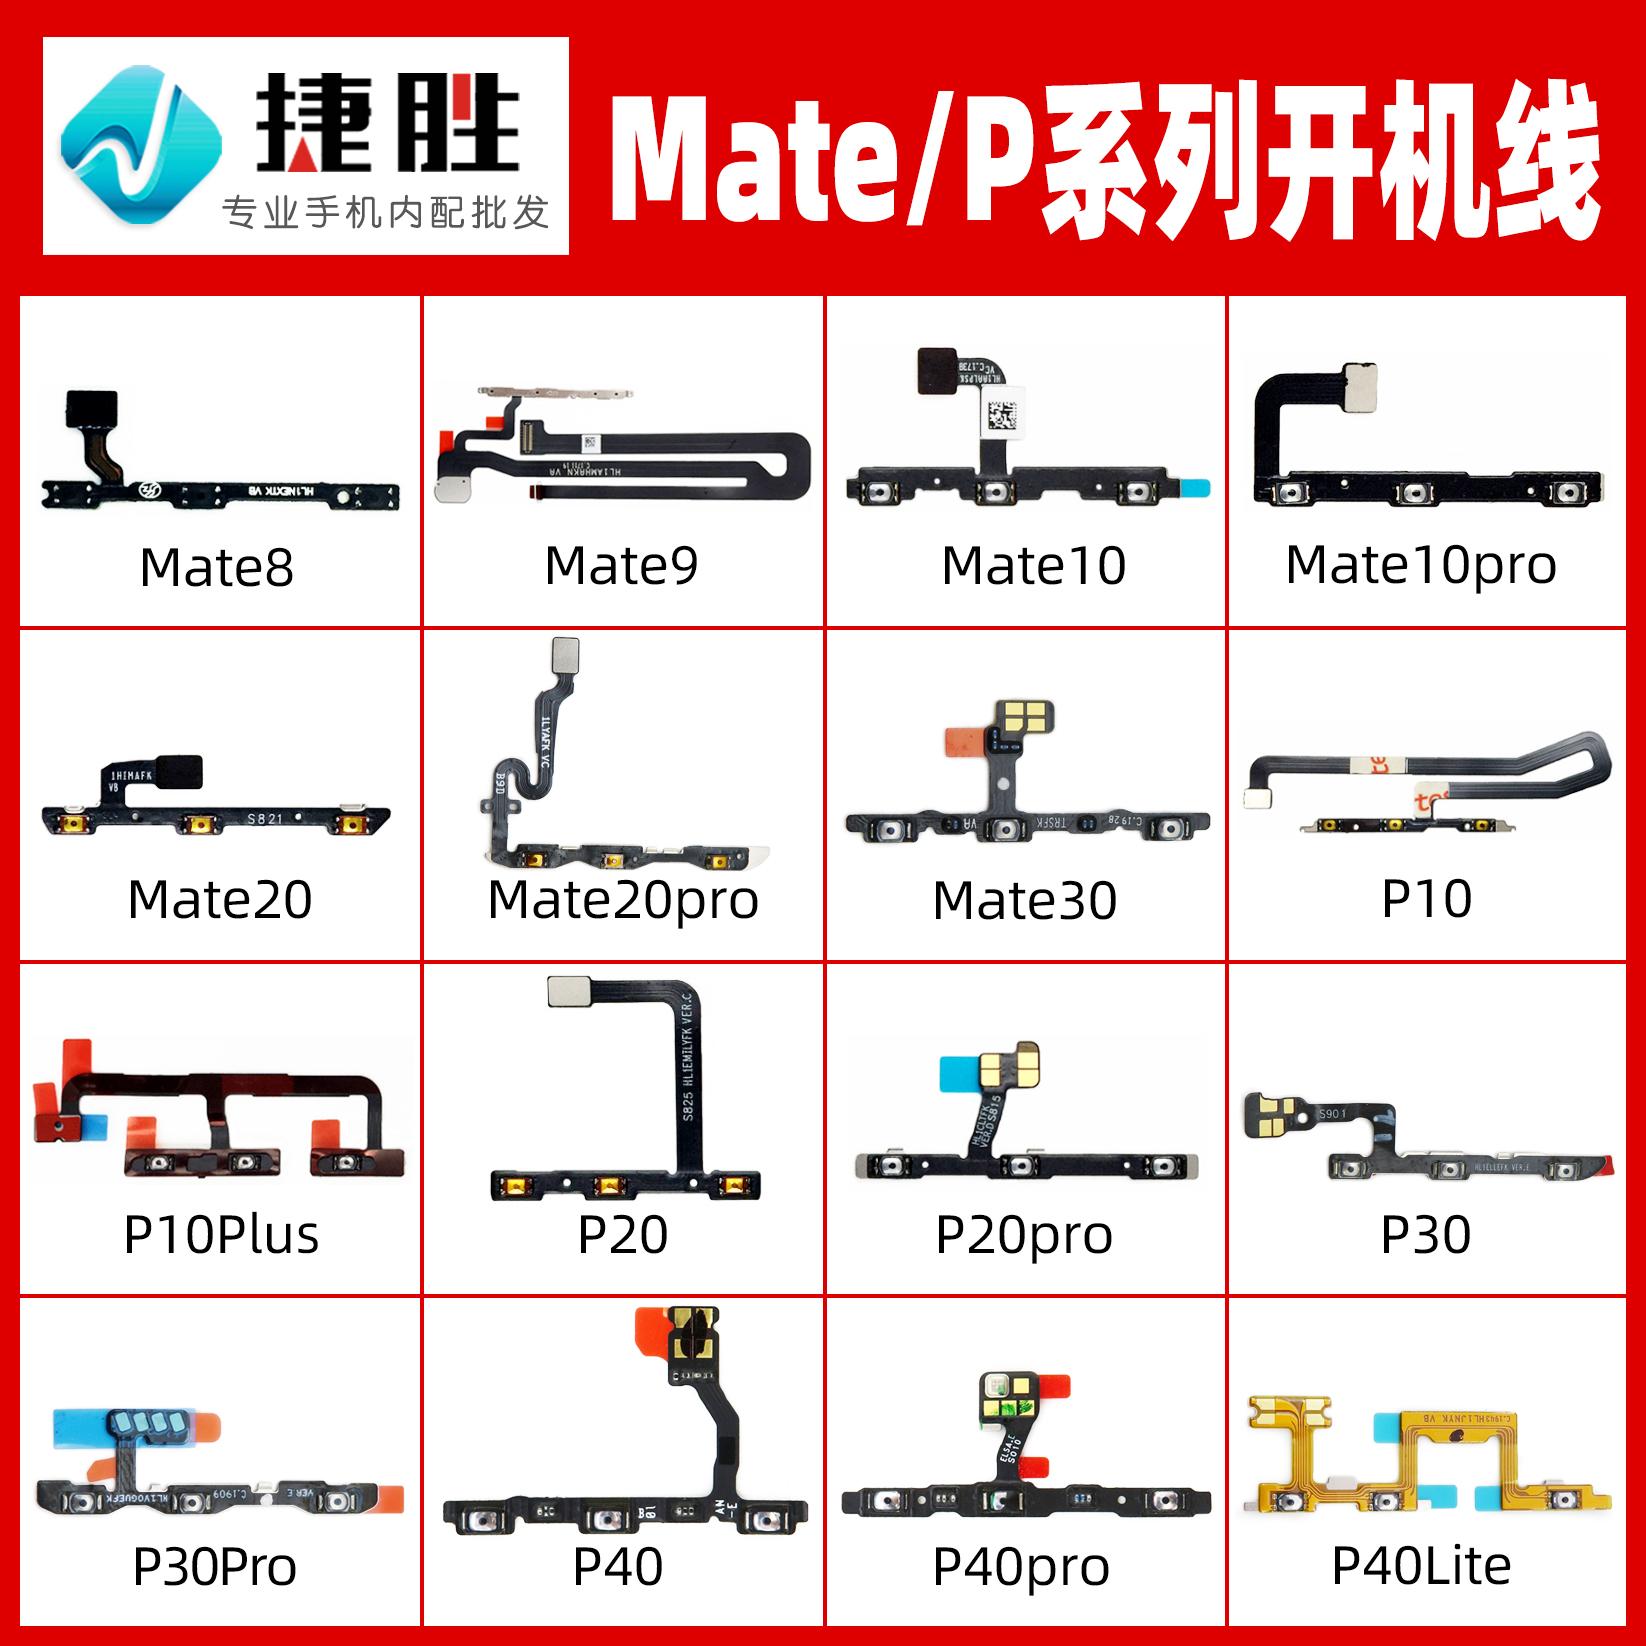 適用ファーウェイMate 8 9 10 20 P 20 P 20 P 20 P 30 P 30 P 30 P 40 P 40プロ起動音量ライン